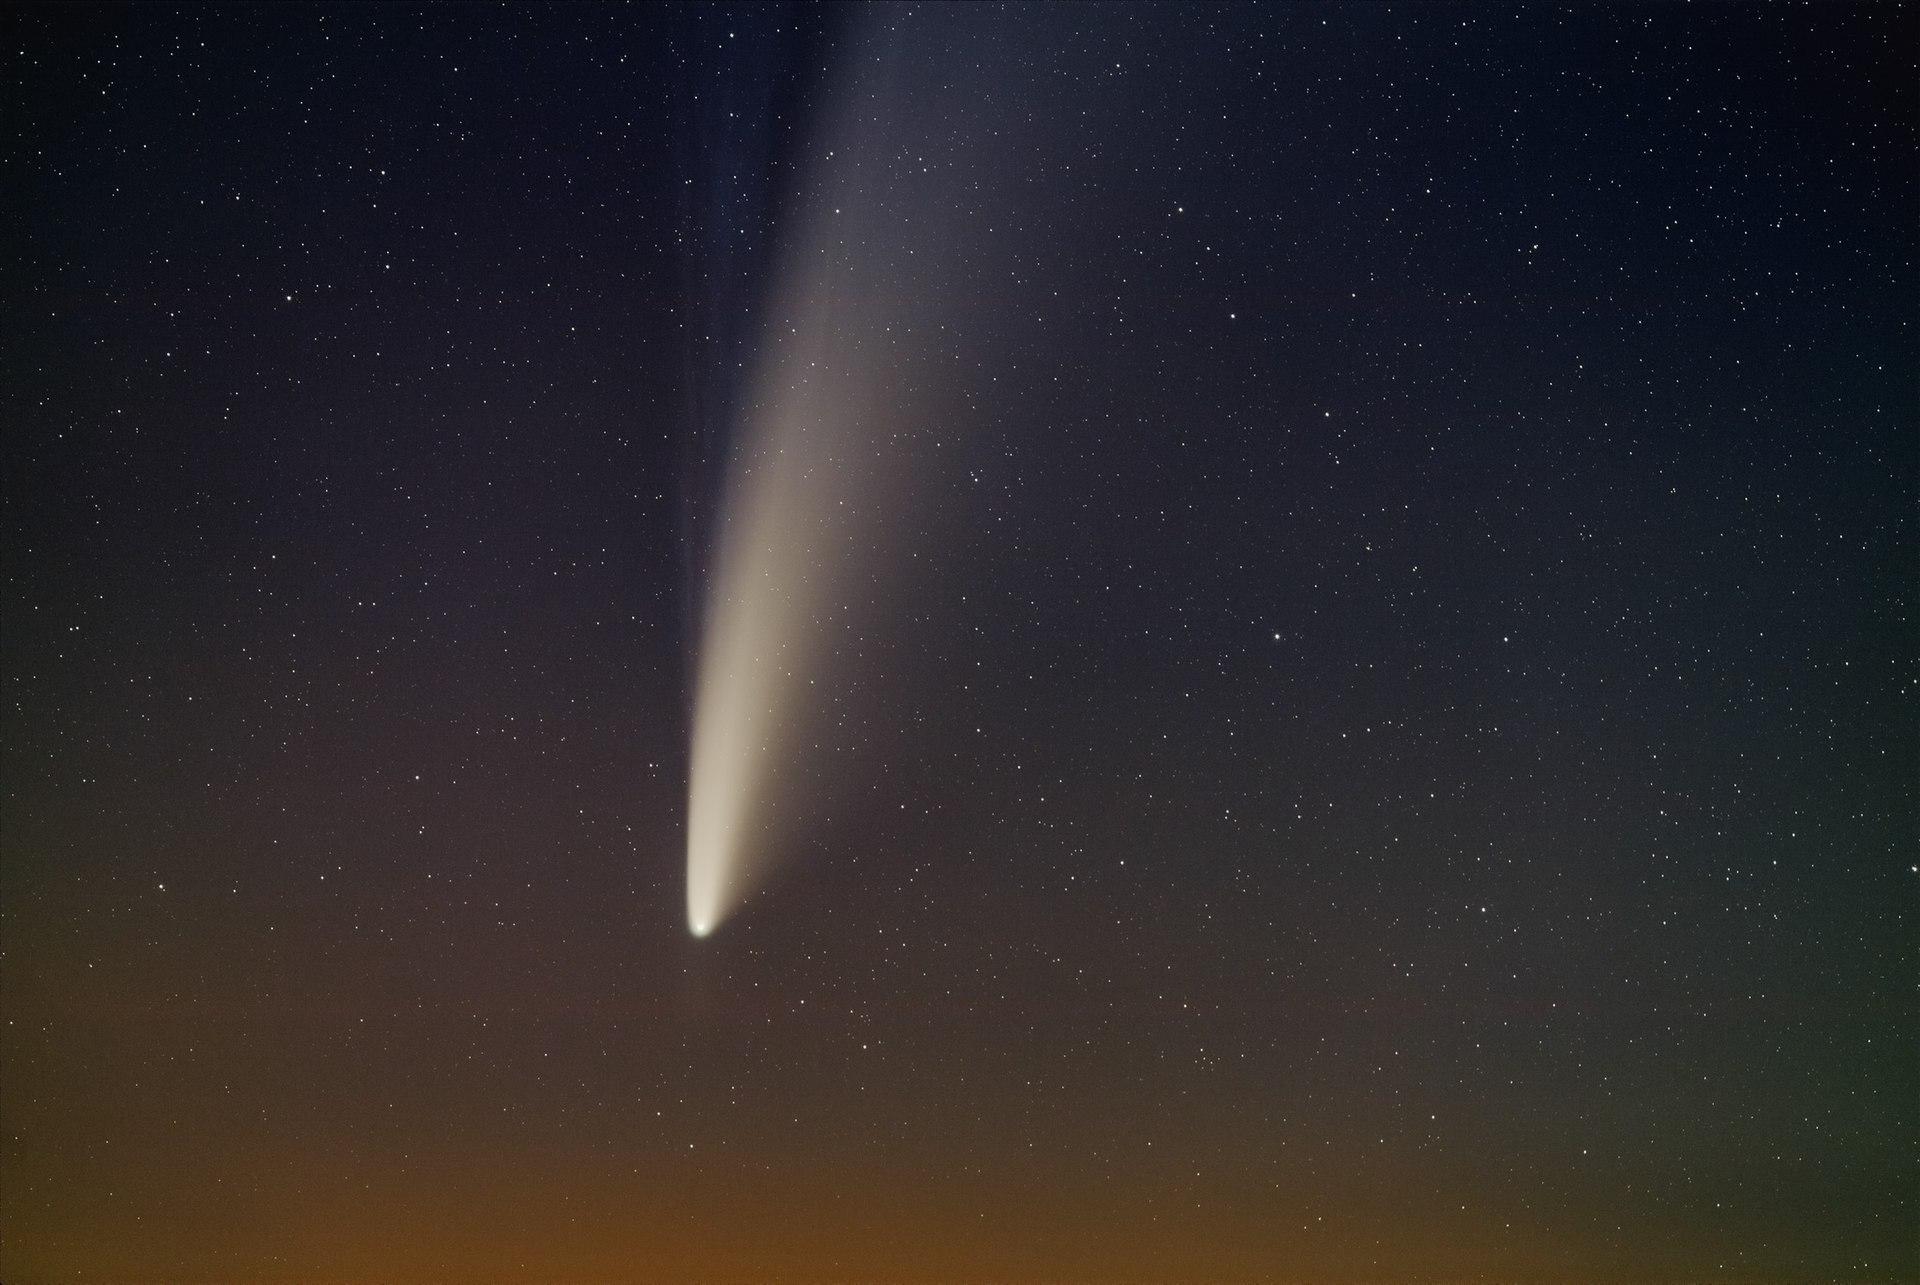 Kometa C/2020 F3 (NEOWISE) | wikipedia.org nuotr.